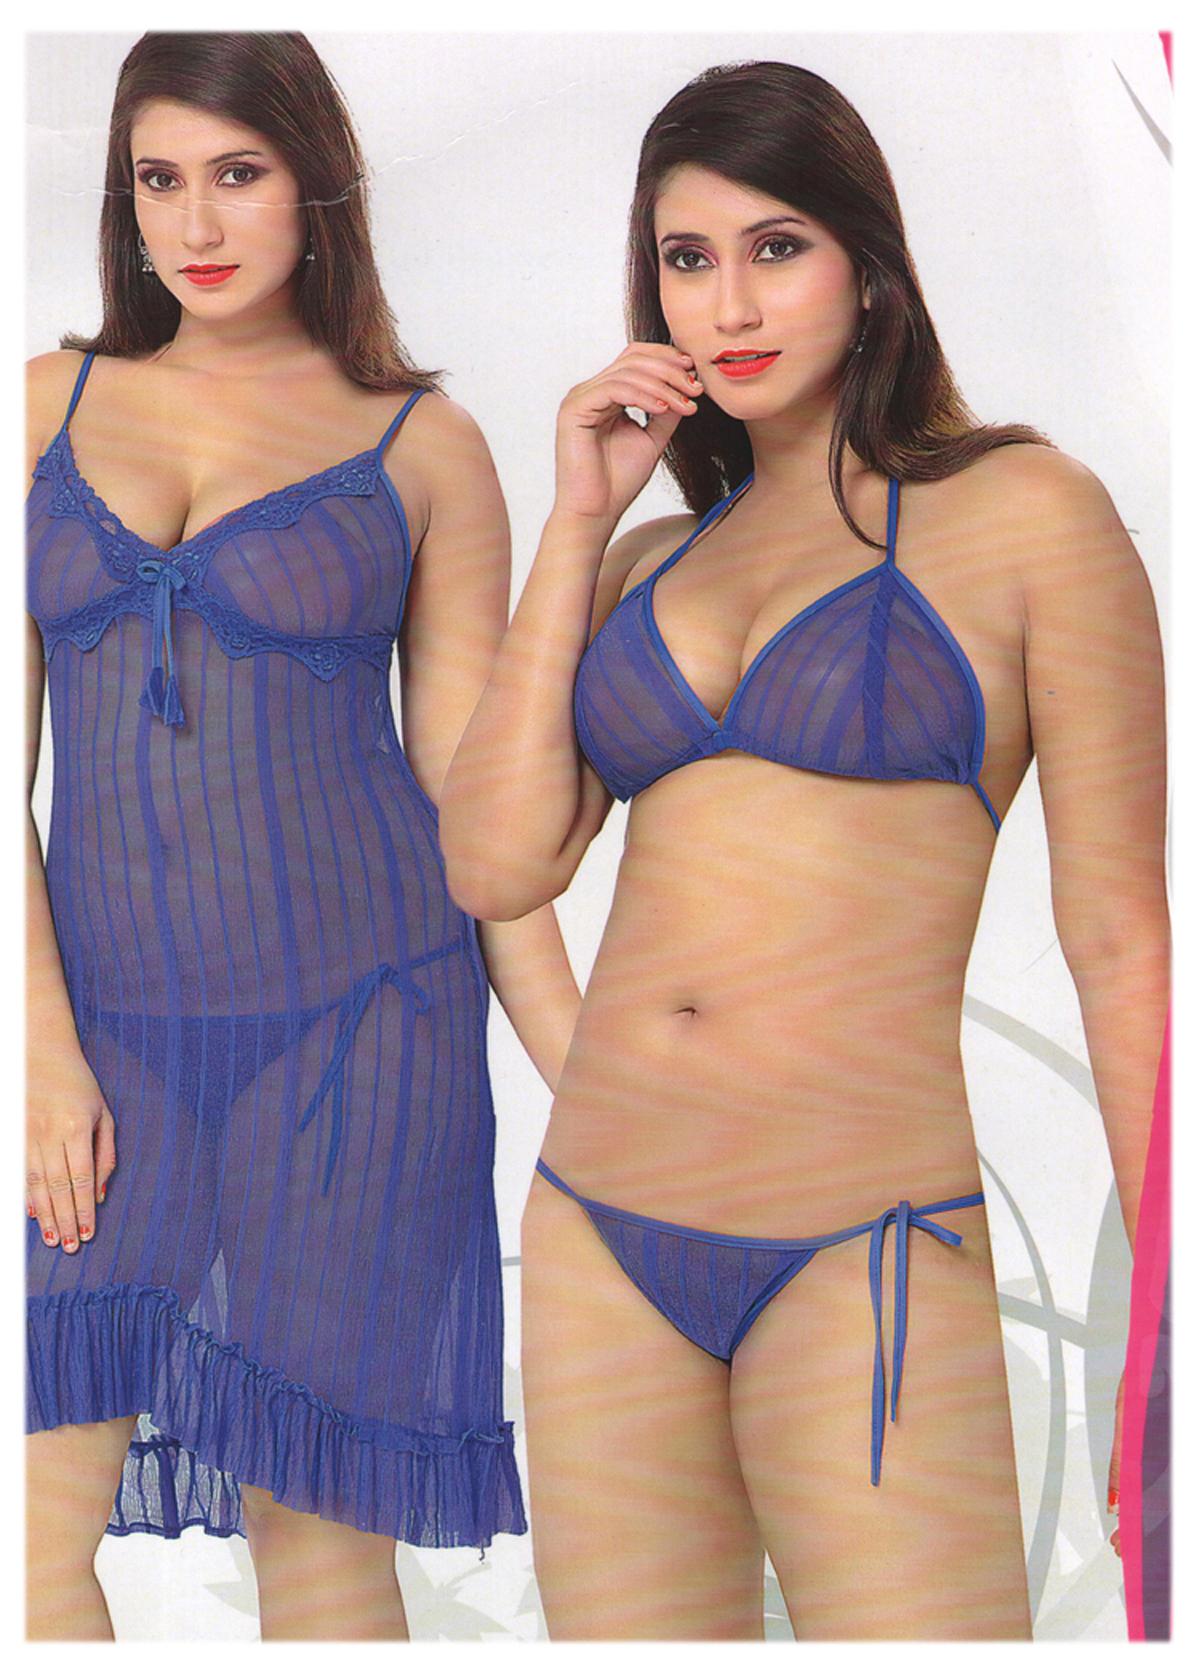 Baby Doll Bedroom Wear Hot Sexy Nighties 3 Pc Set  Global -1170